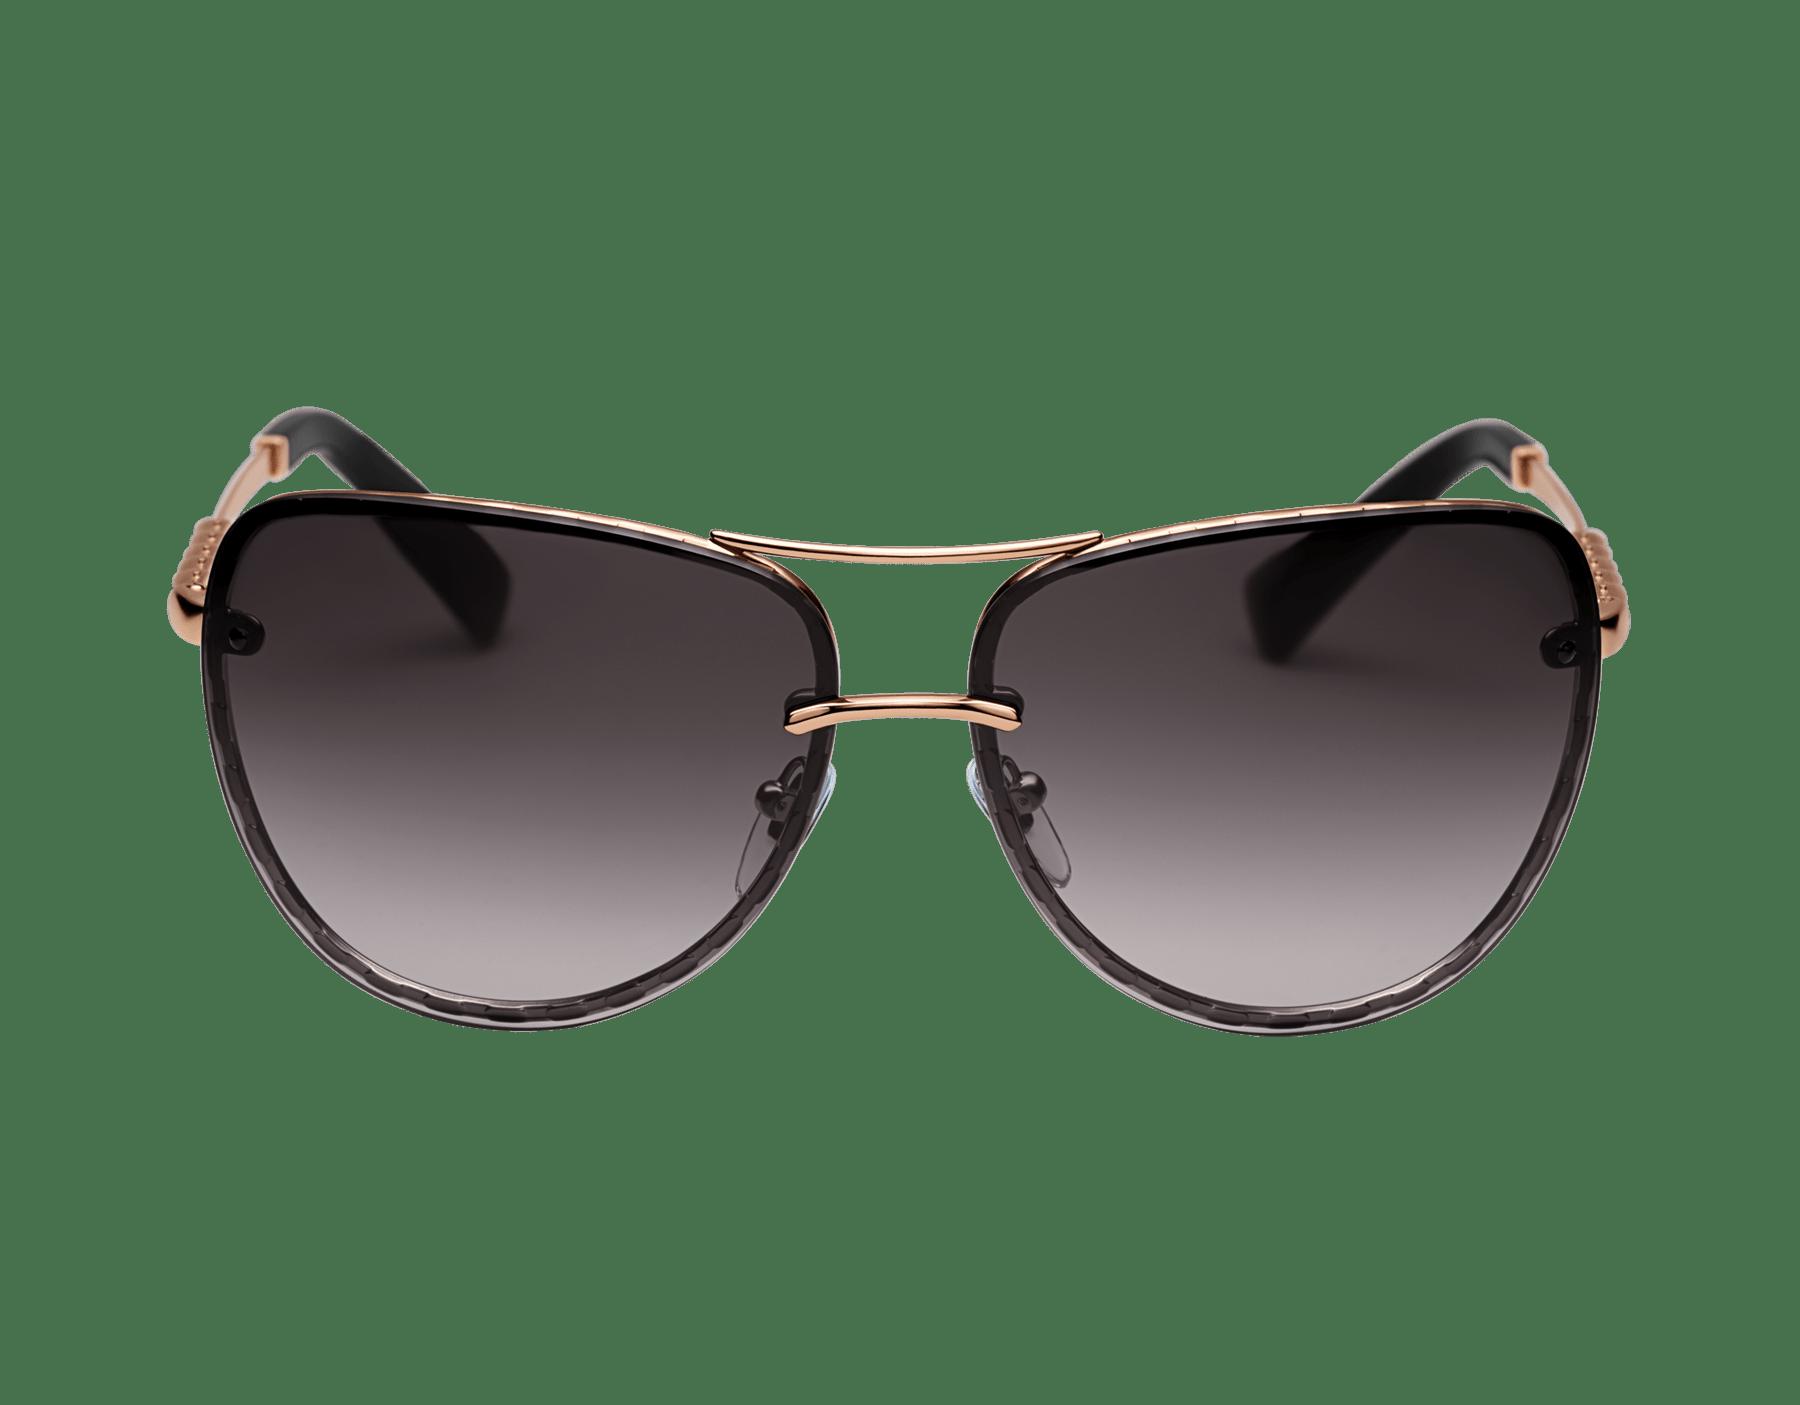 Bvlgari Serpenti Pilot gold plated metal sunglasses with gemstones and polar lenses. 903683 image 2